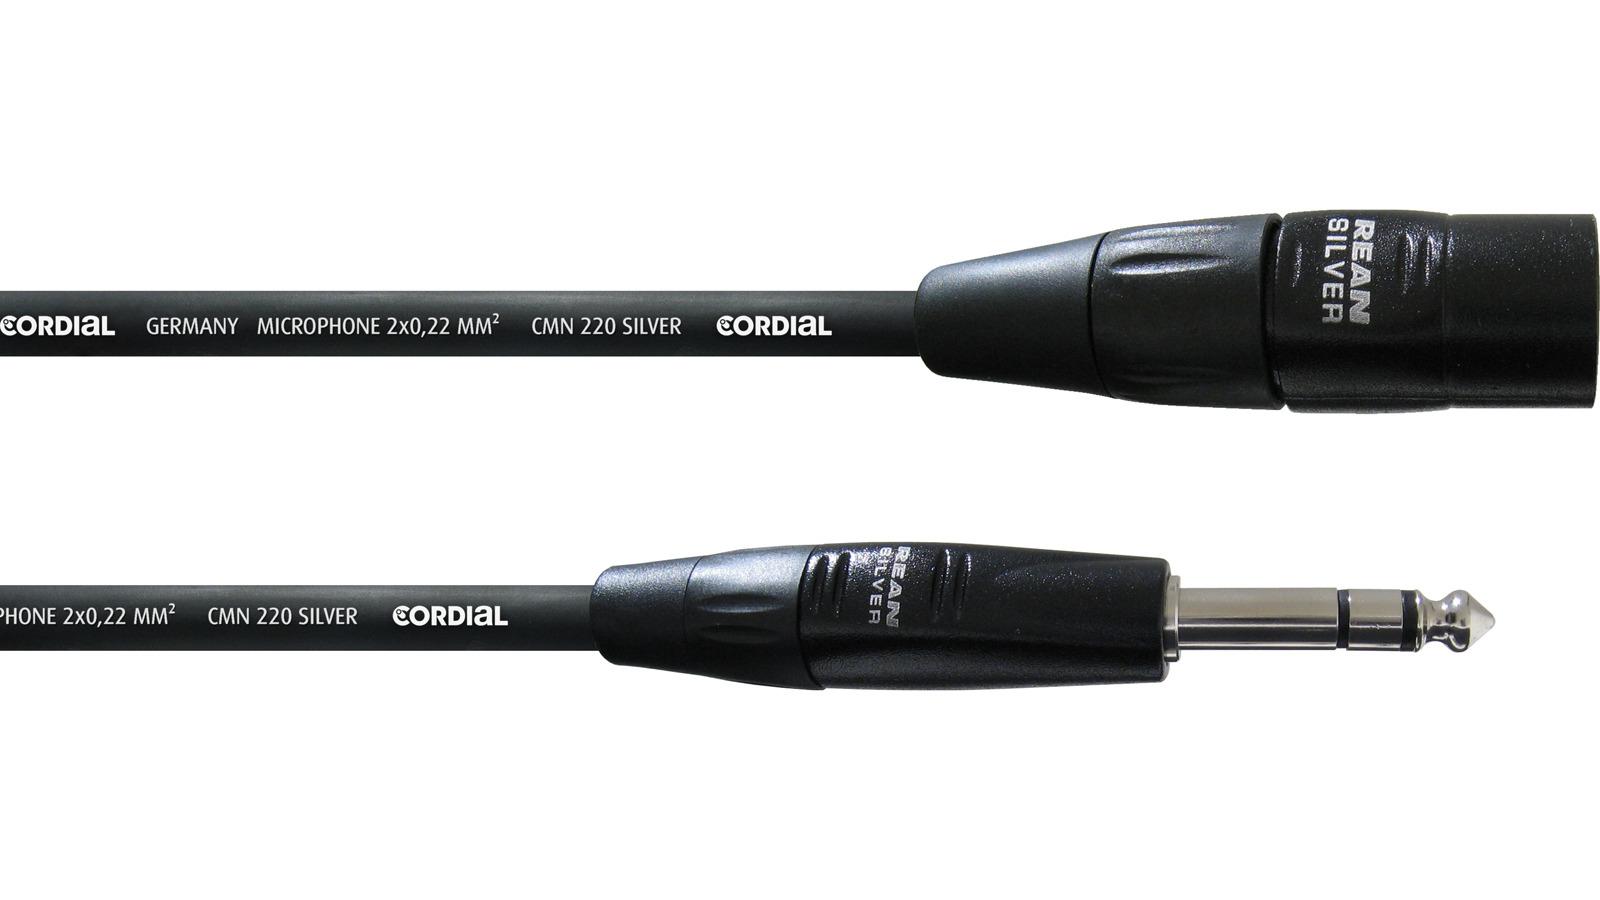 Cordial symmetrisches Kabel  0,3 m CIM 0,3 MV